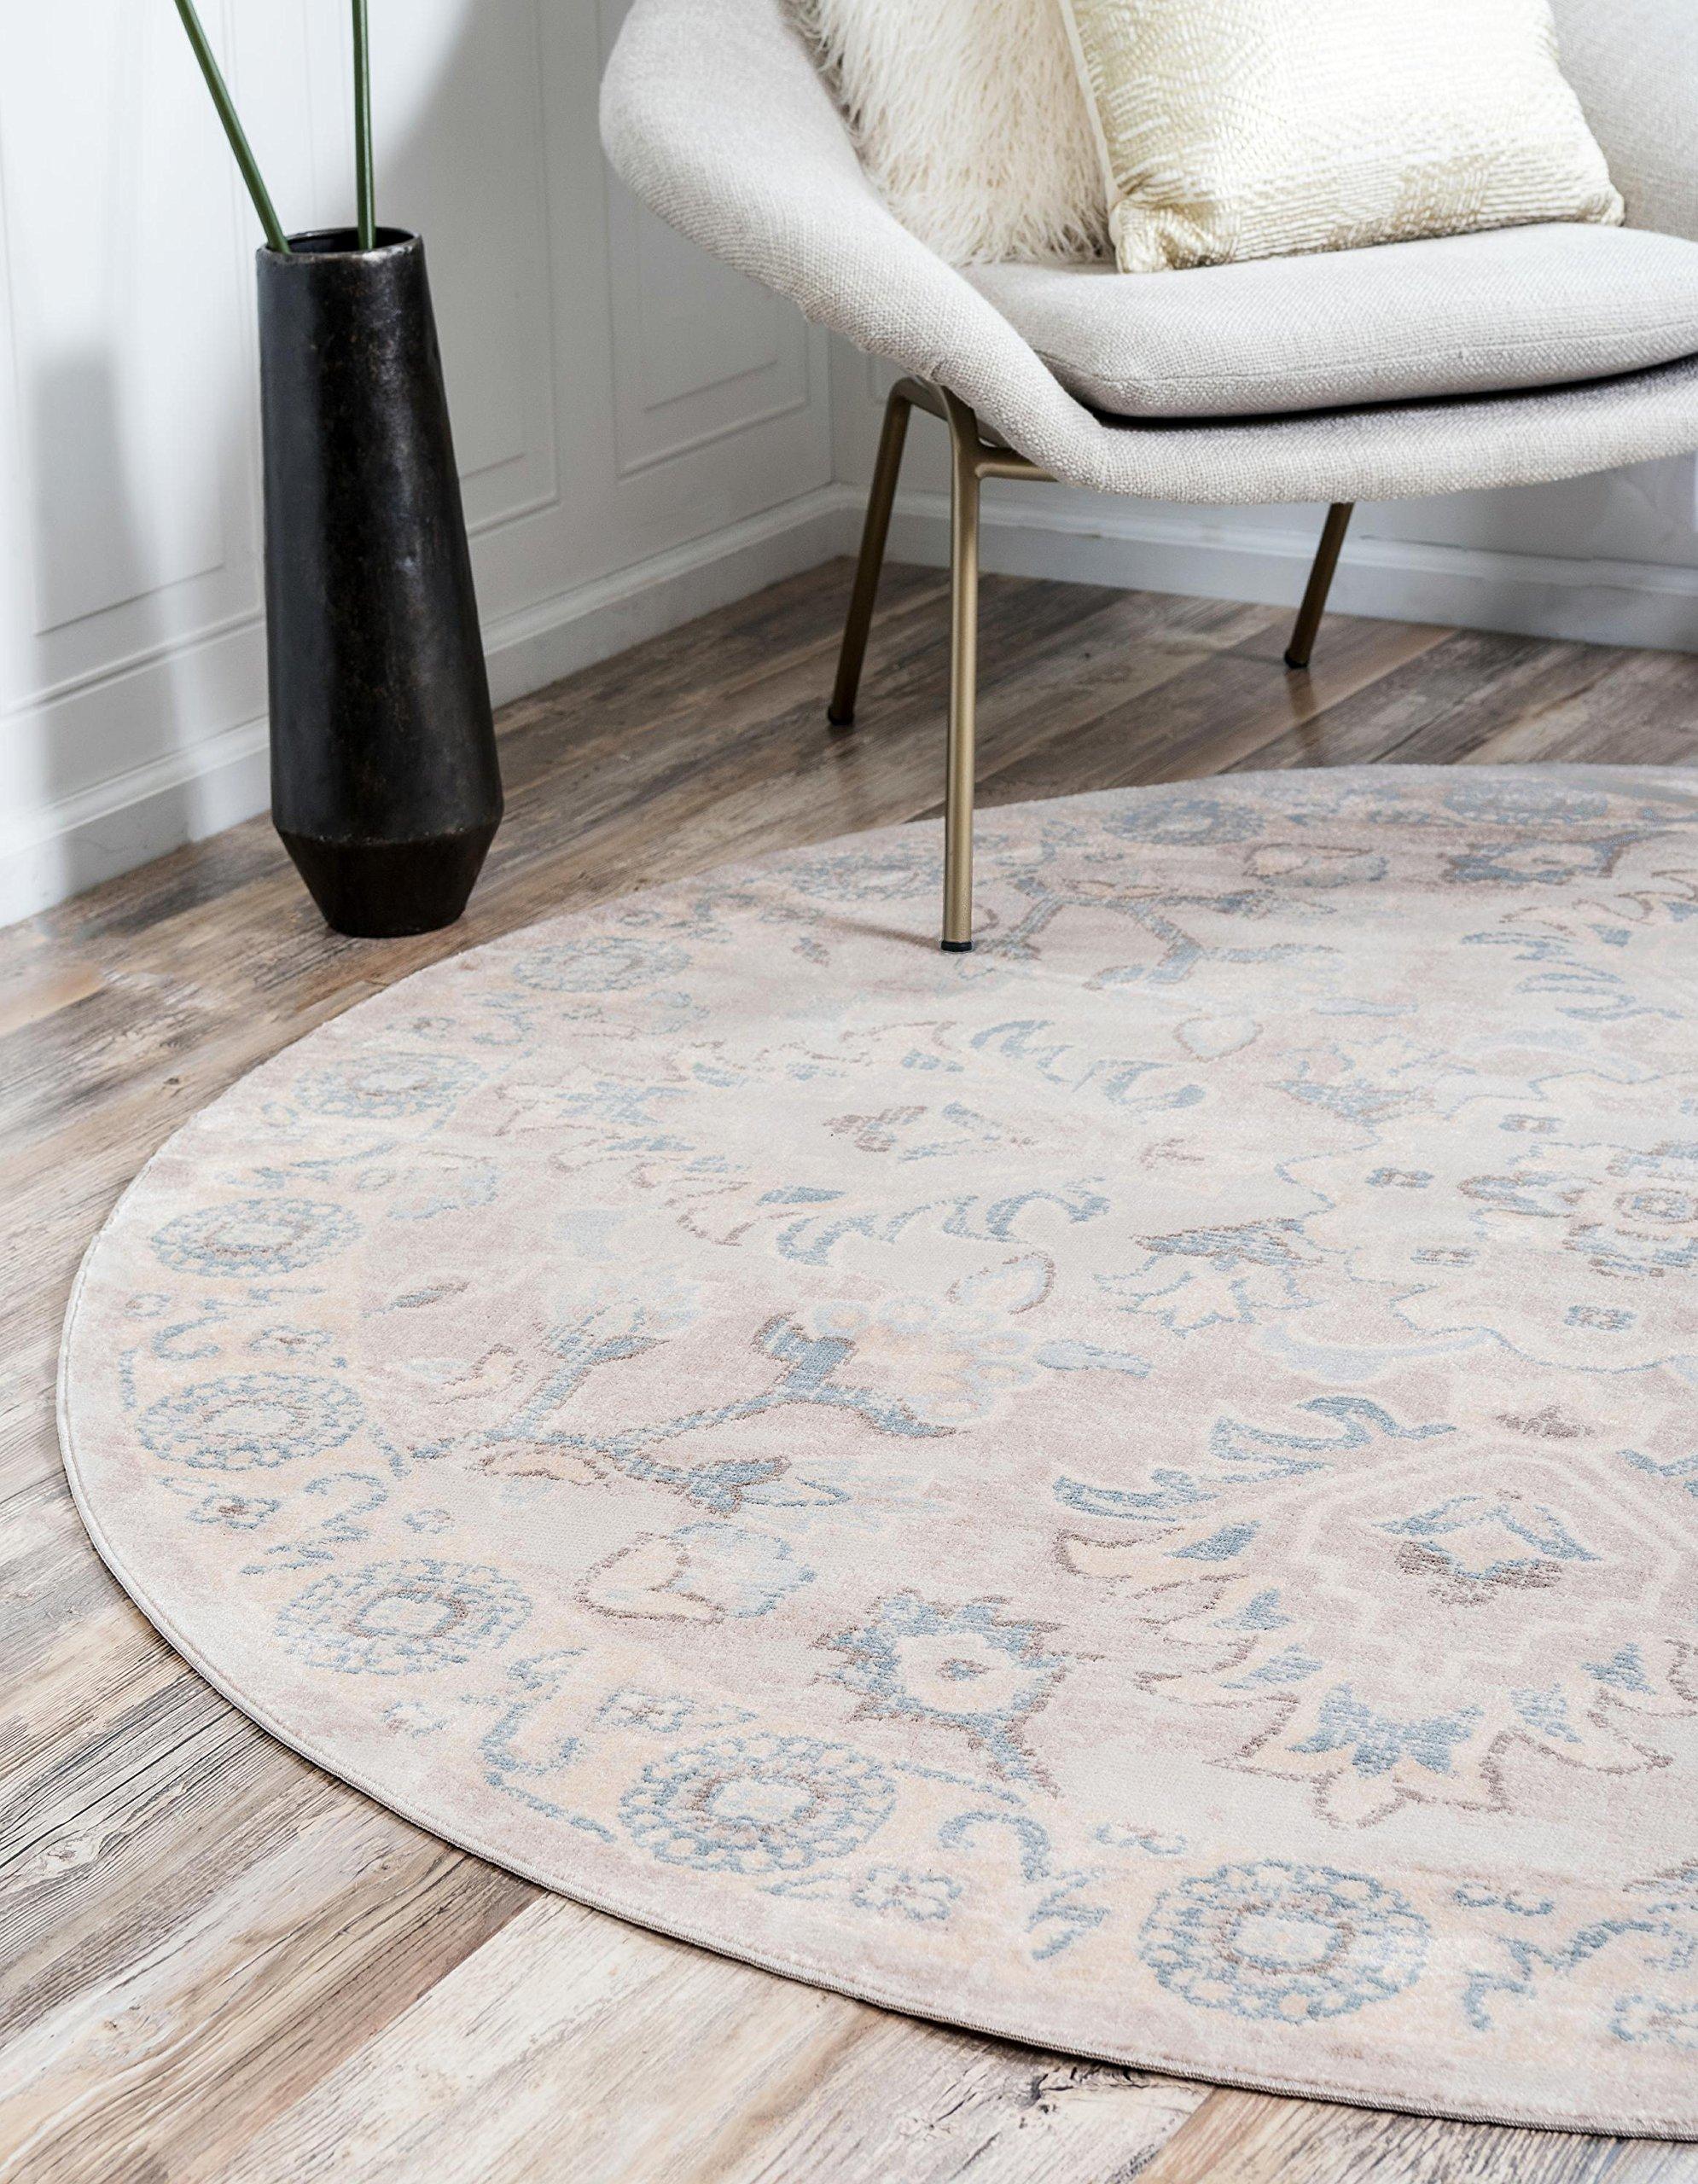 Unique Loom Paris Collection Pastel Tones Traditional Distressed Gray Round Rug (6' 0 x 6' 0)